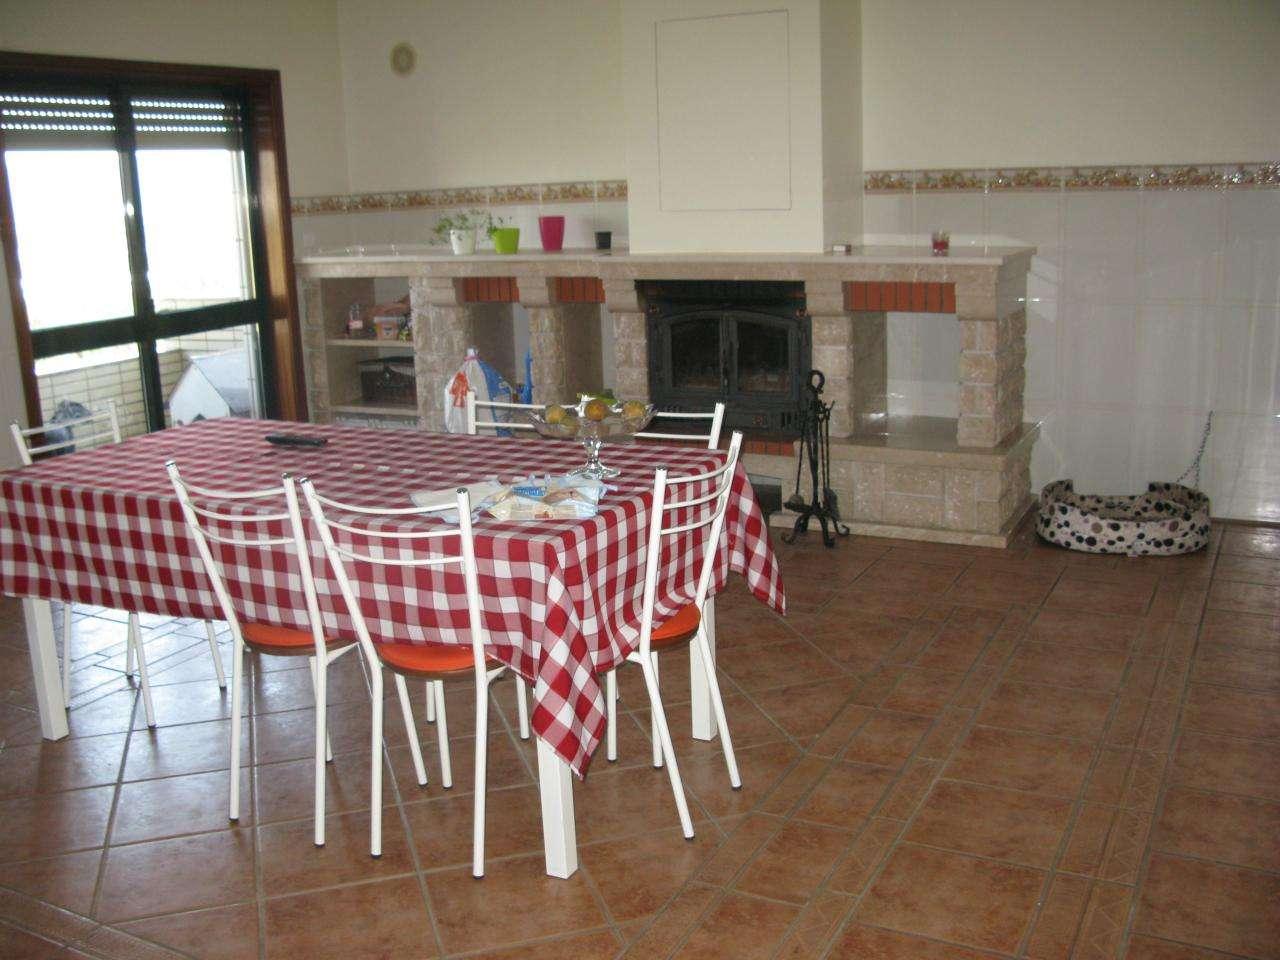 Apartamento para comprar, Vila de Cucujães, Aveiro - Foto 2